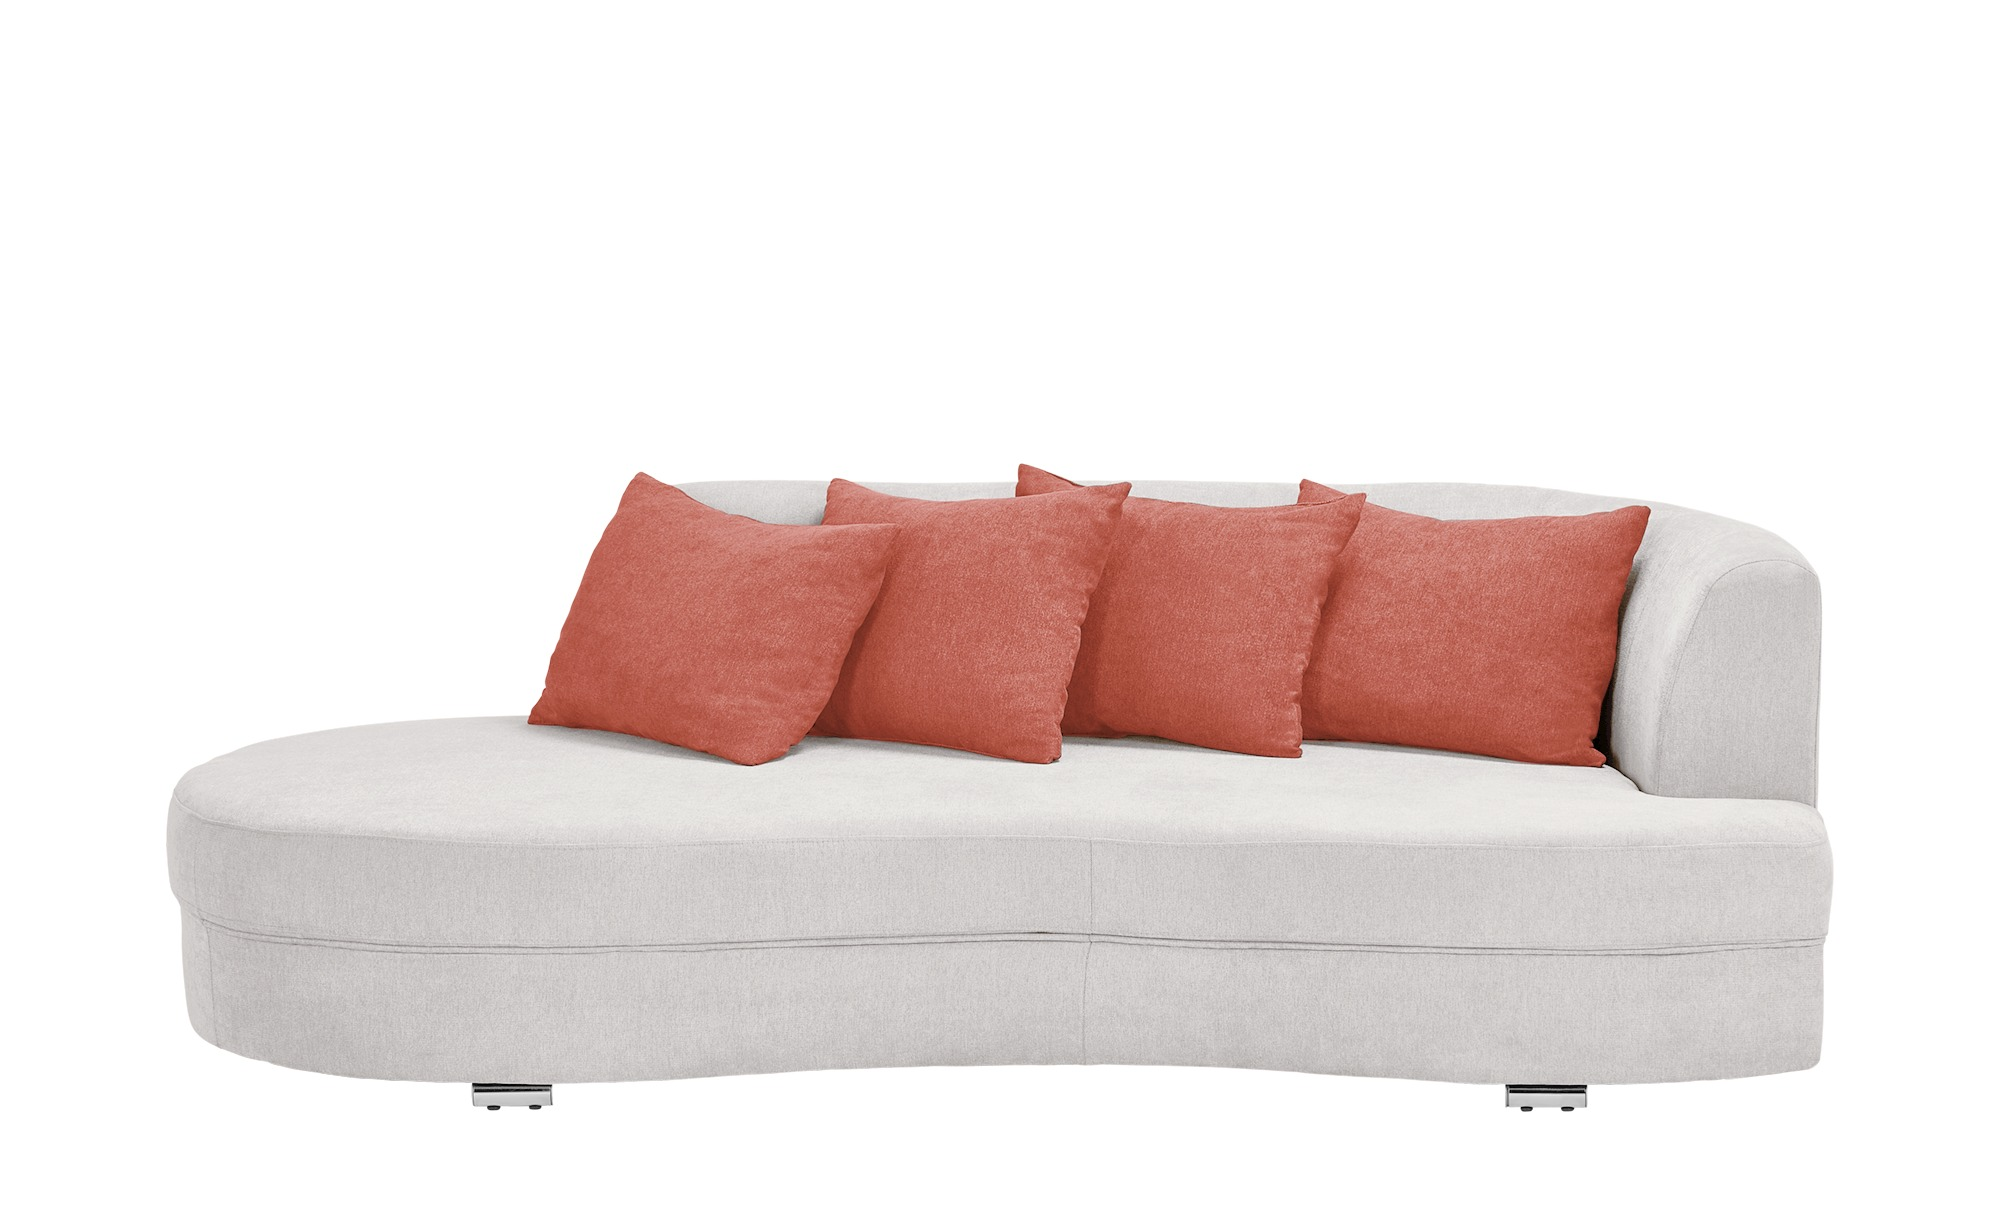 Full Size of Big Sofa Im Kolonialstil Nadja Smart Beige   Flachgewebe Wollwei Himolla Schlafsofa Liegefläche 160x200 Federkern Mit Hocker Home Affair Xxl 2 Sitzer Ikea Wohnzimmer Big Sofa Nadja